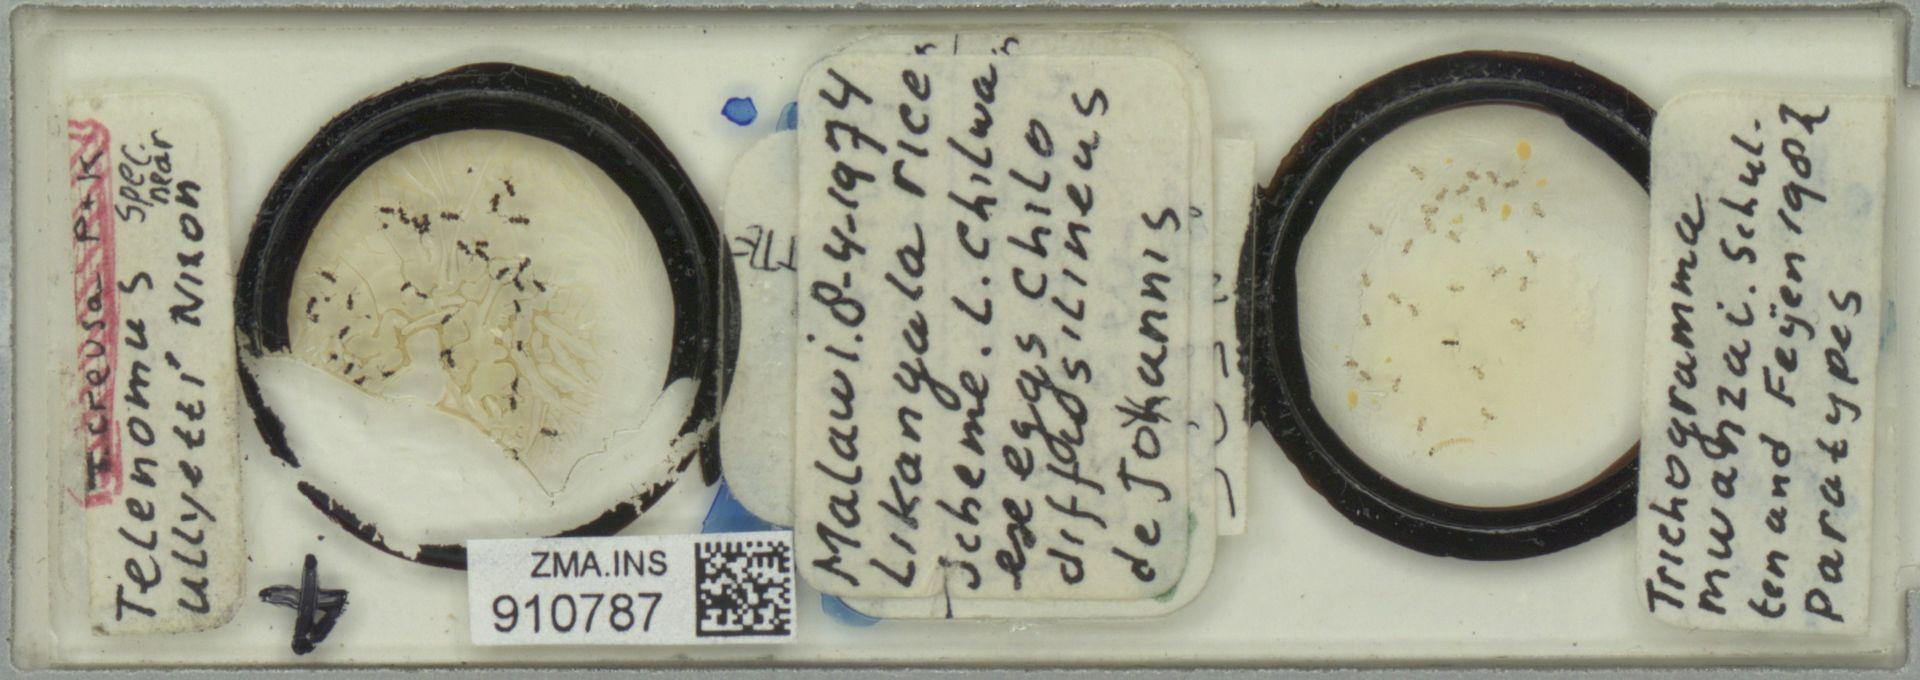 ZMA.INS.910787 | Trichogramma mwanzai Schulten & Feijen, 1982